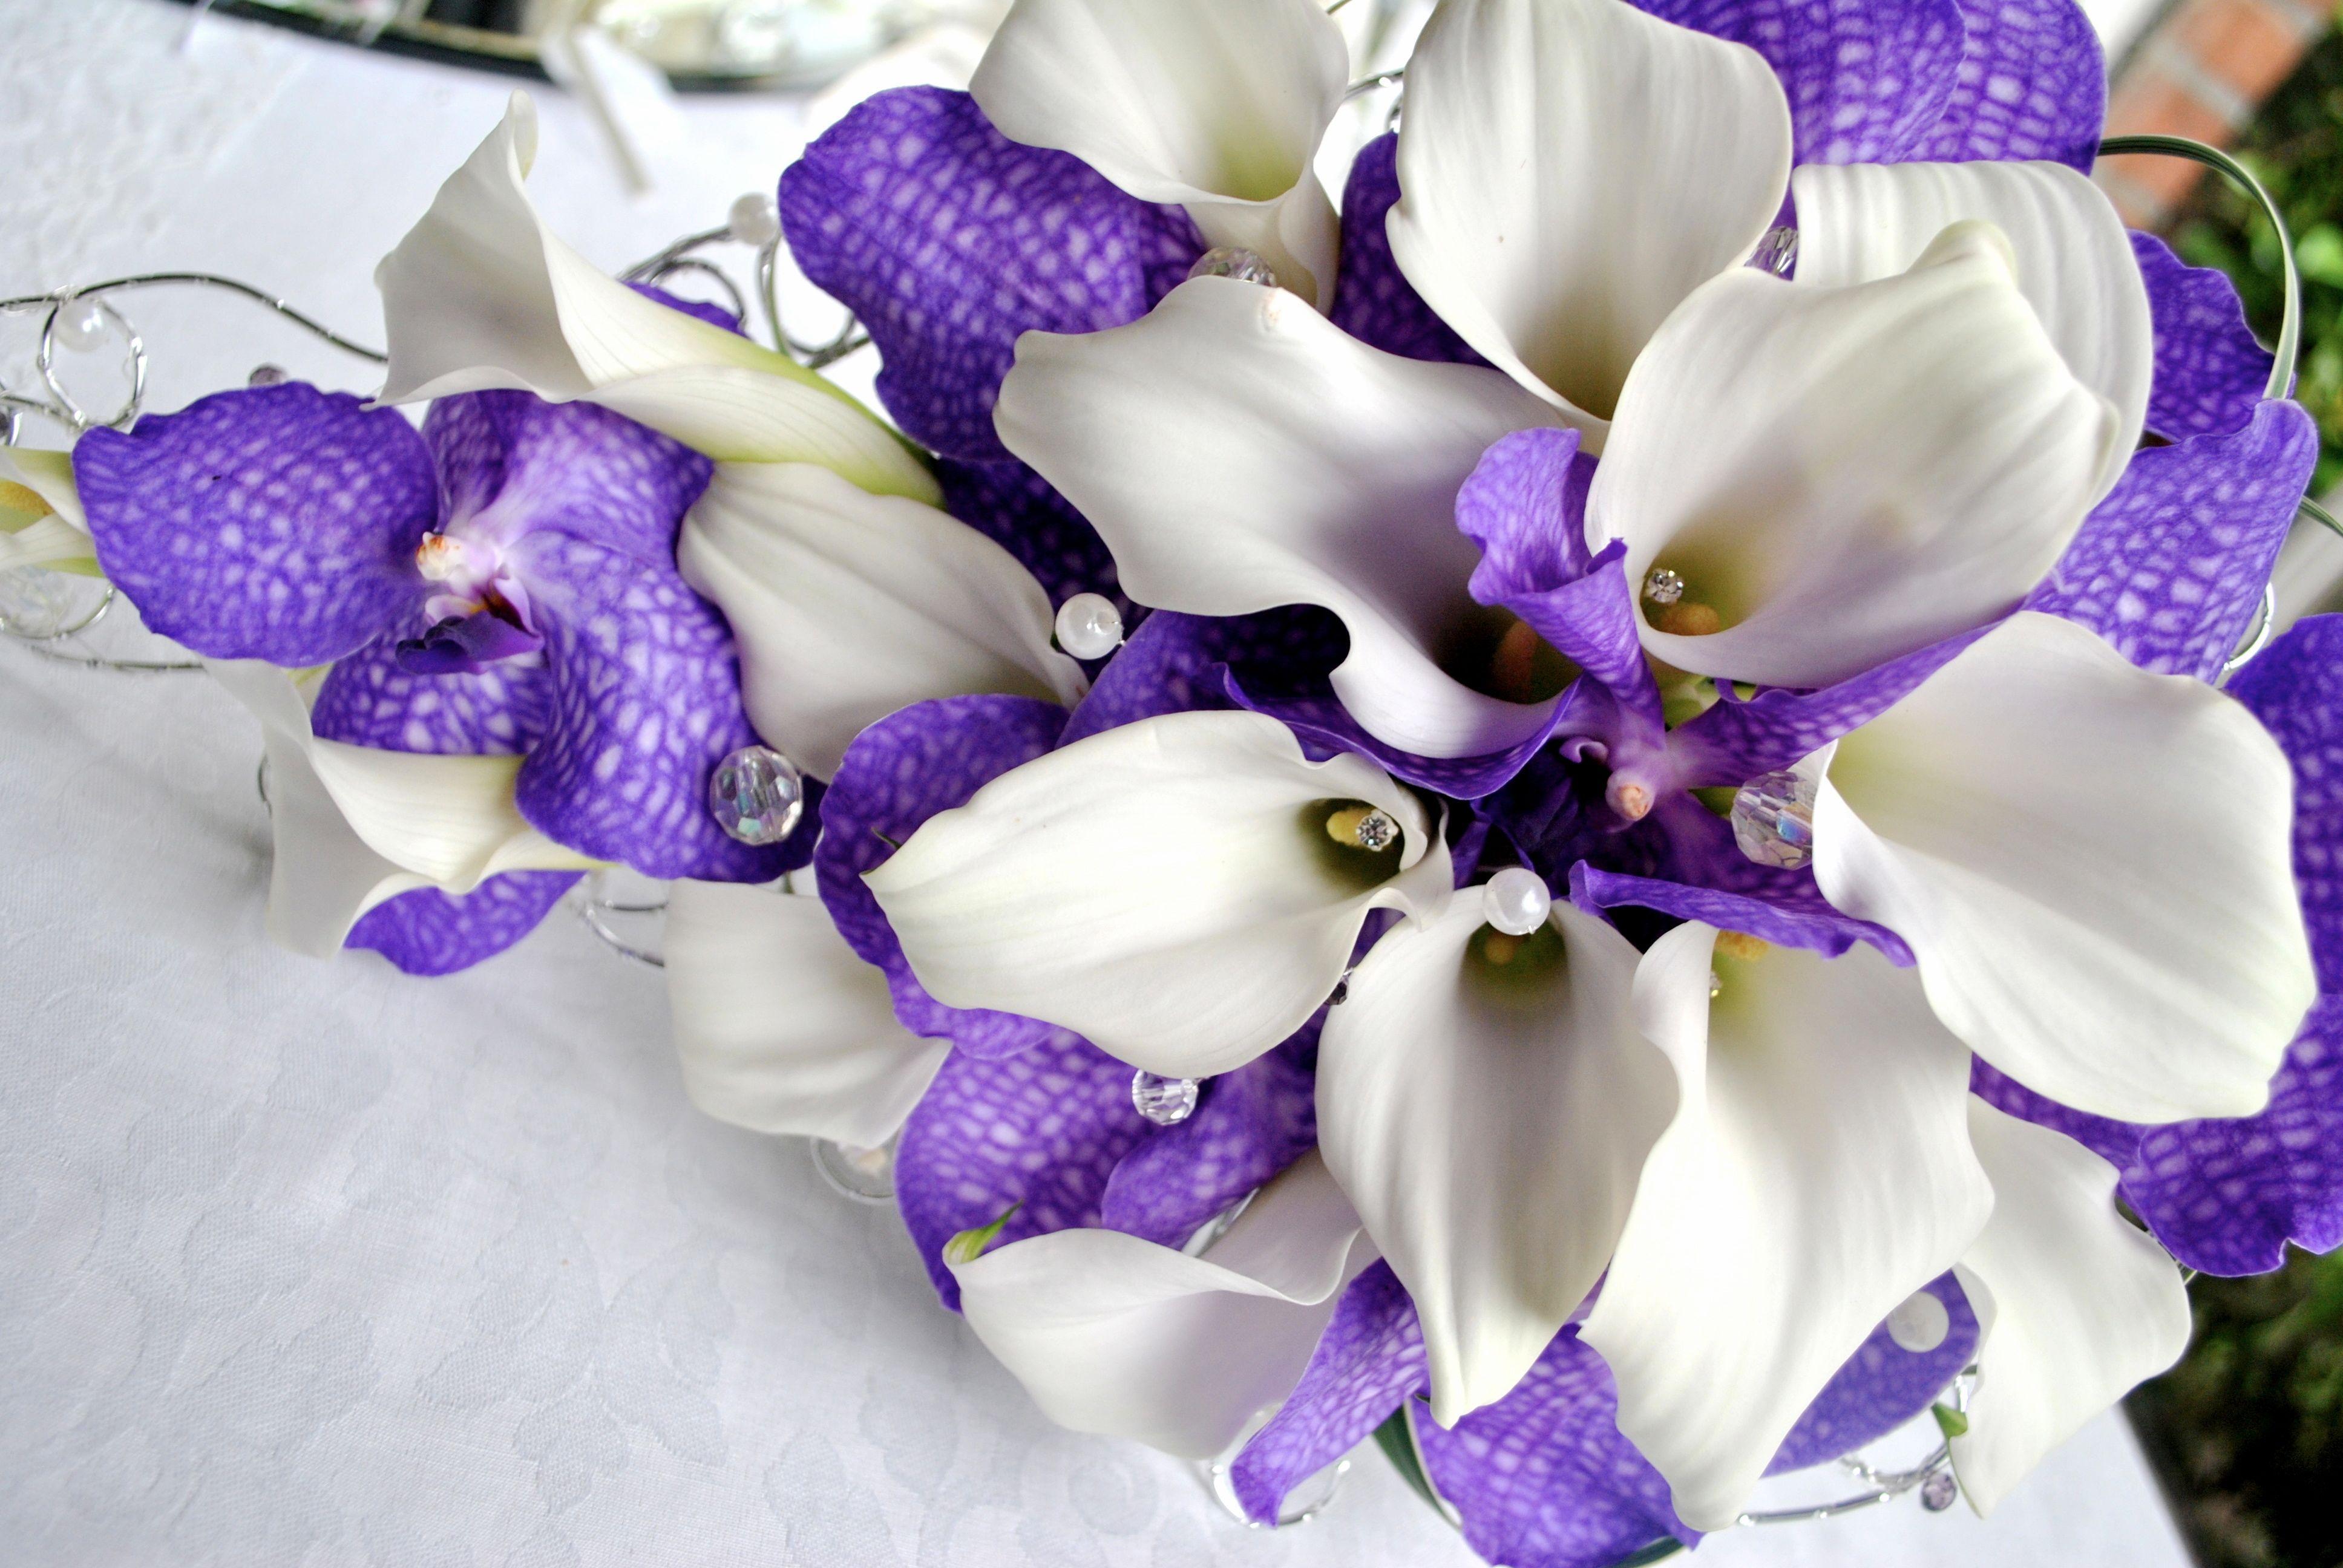 Purple and white wedding flowers laurel weddings wedding stuff purple and white wedding flowers laurel weddings izmirmasajfo